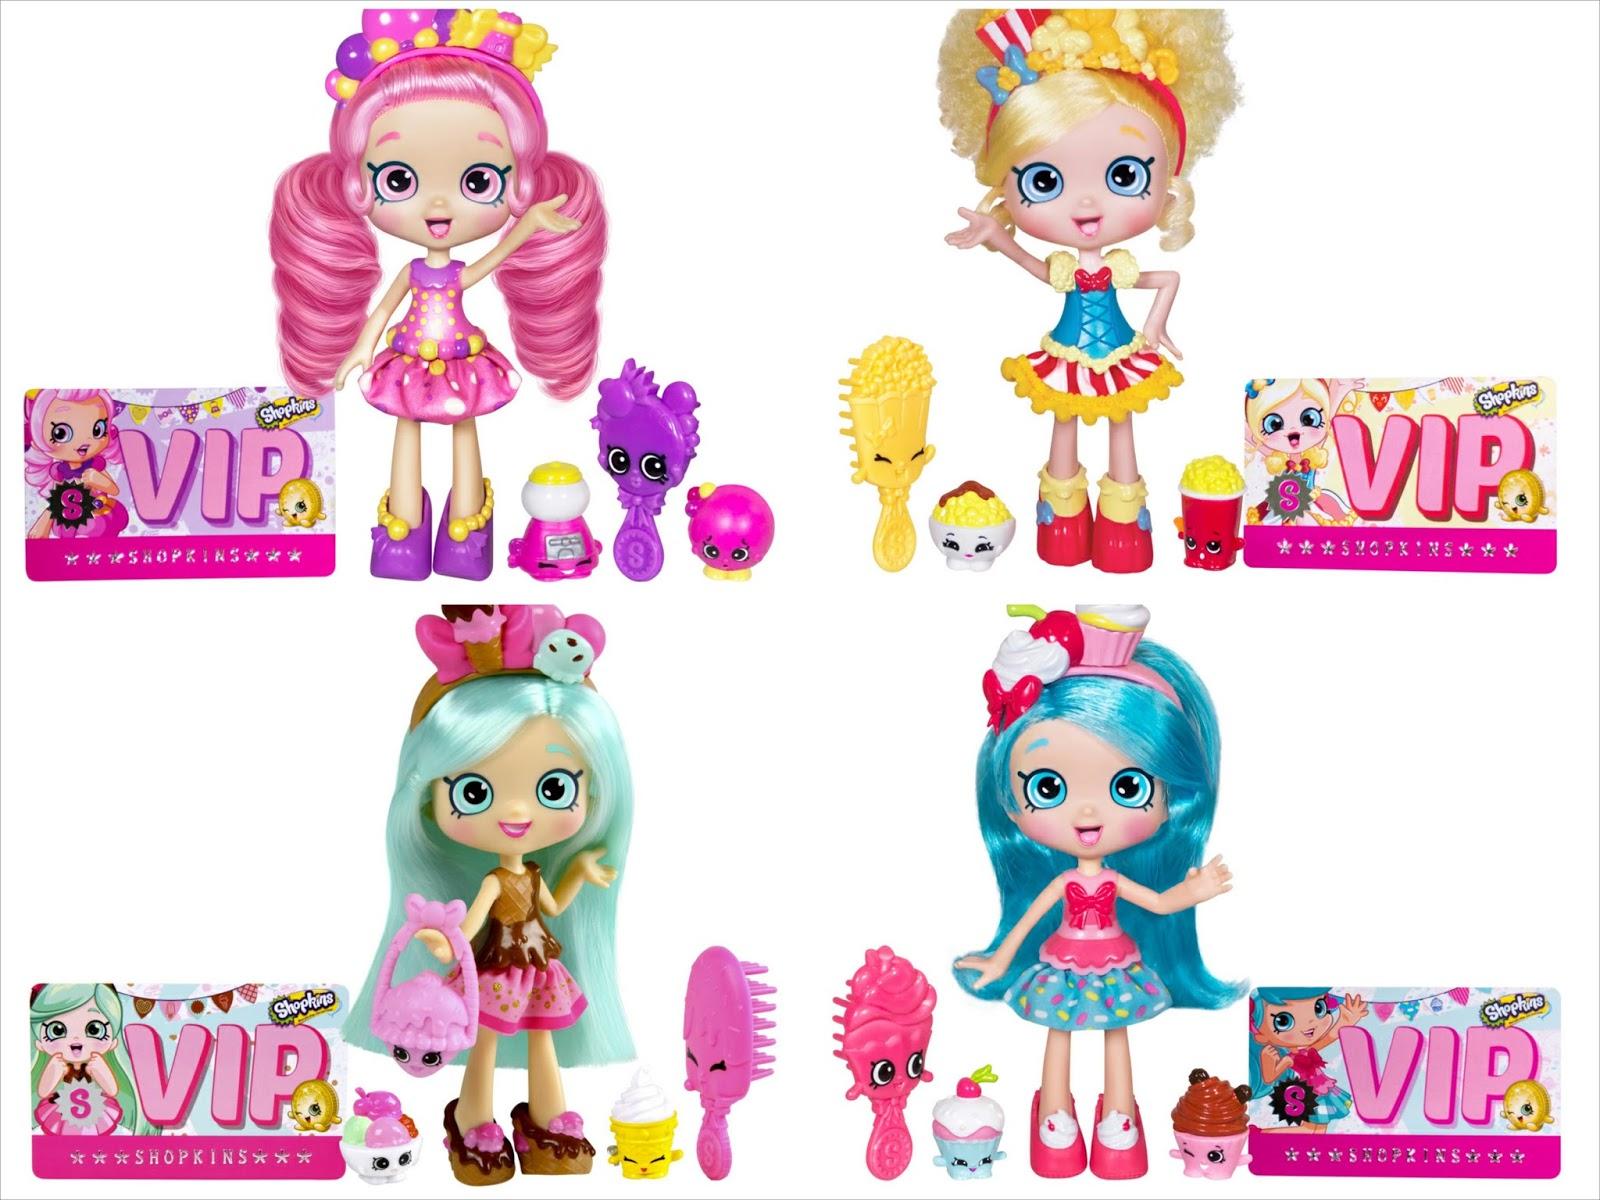 Little housewife shopkins shoppies - Shopkins pics ...